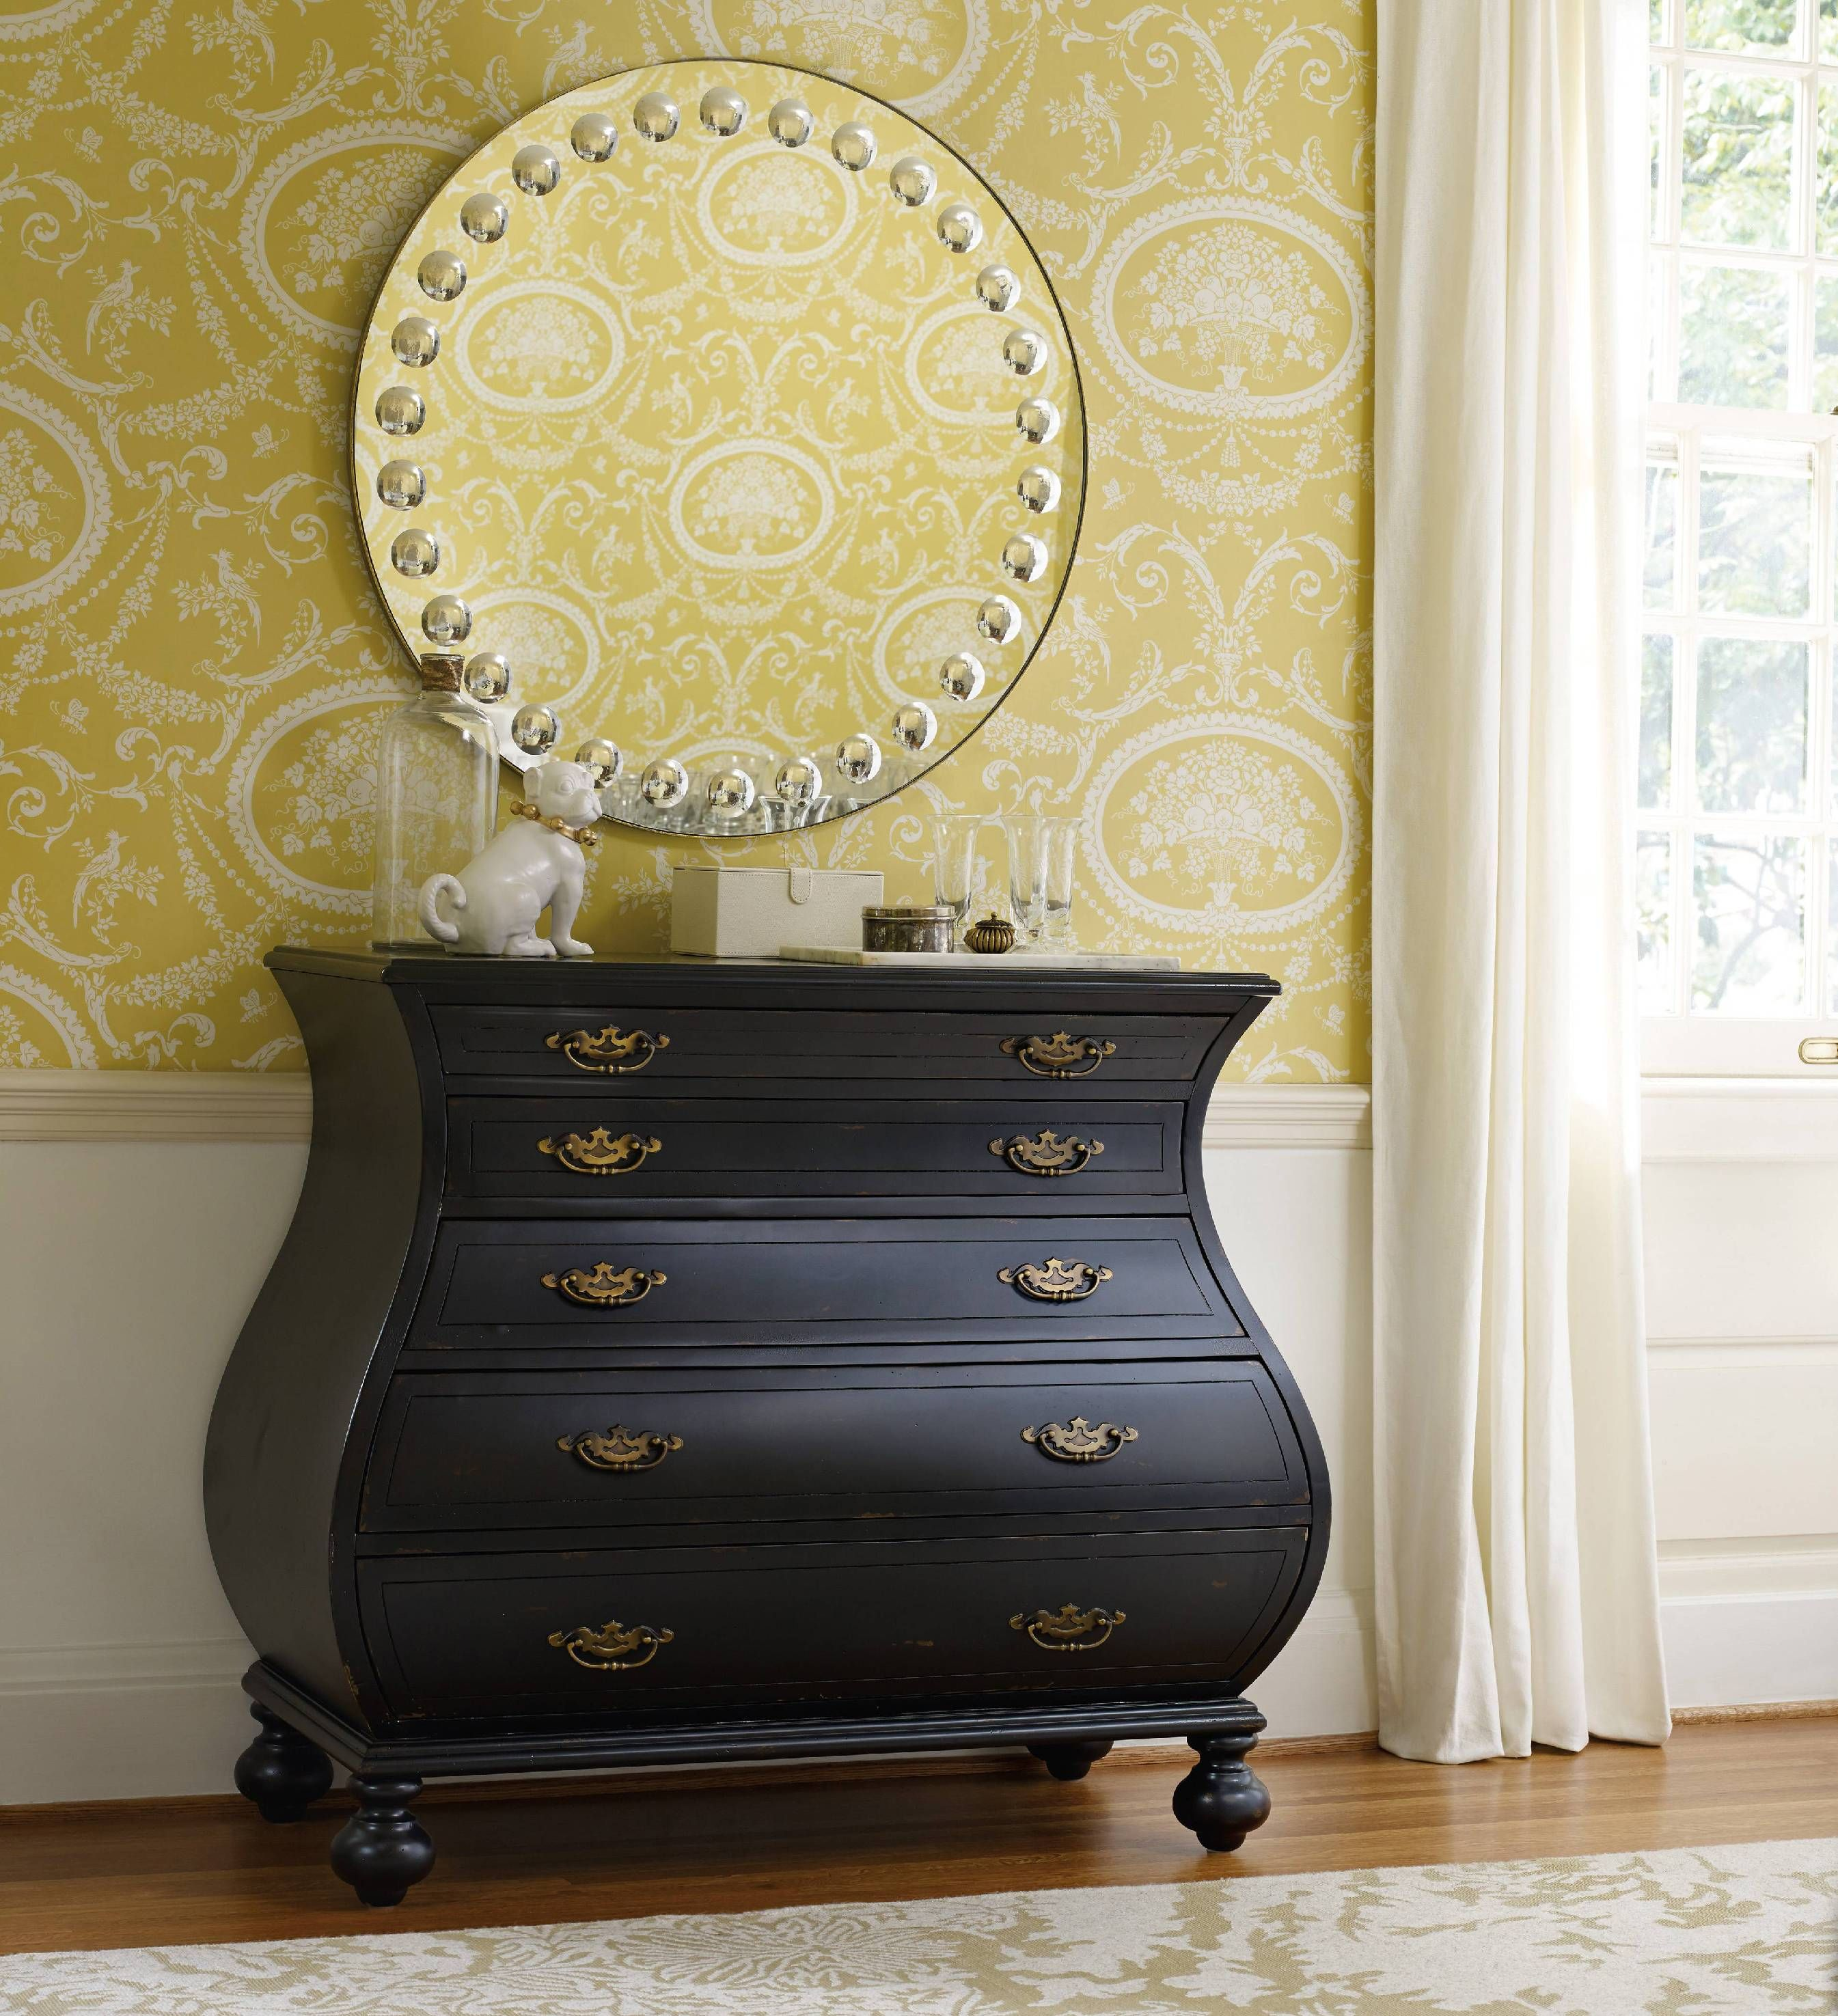 living room chest of drawers. Hooker Furniture Living Room Black Bombe Chest 5219 85001  DIFFA